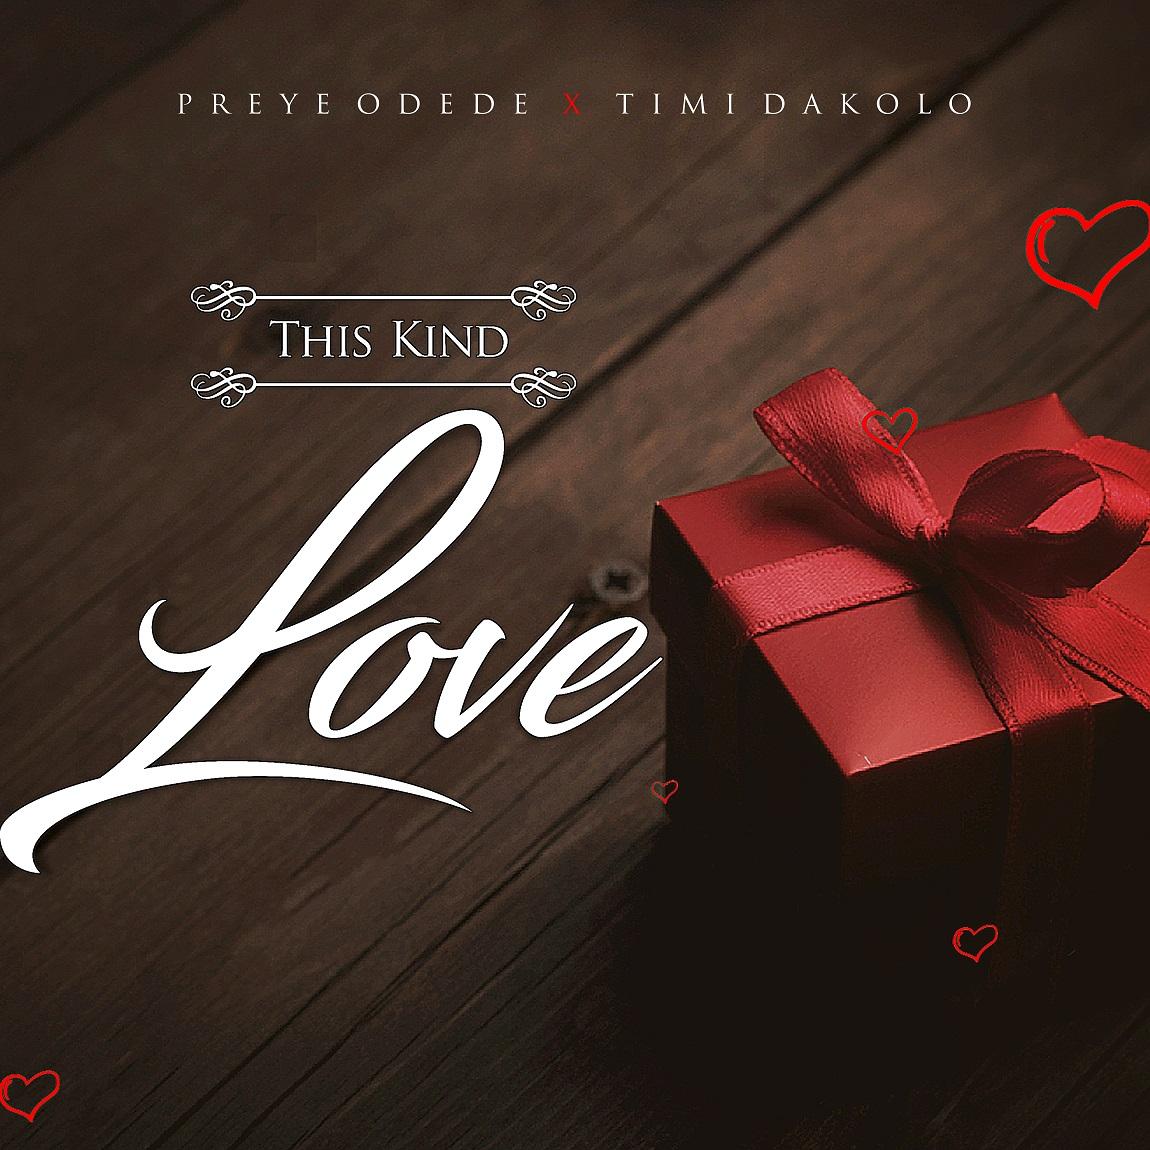 DOWNLOAD MP3: Preye Odede - This Kind Love Ft. Timi Dakolo